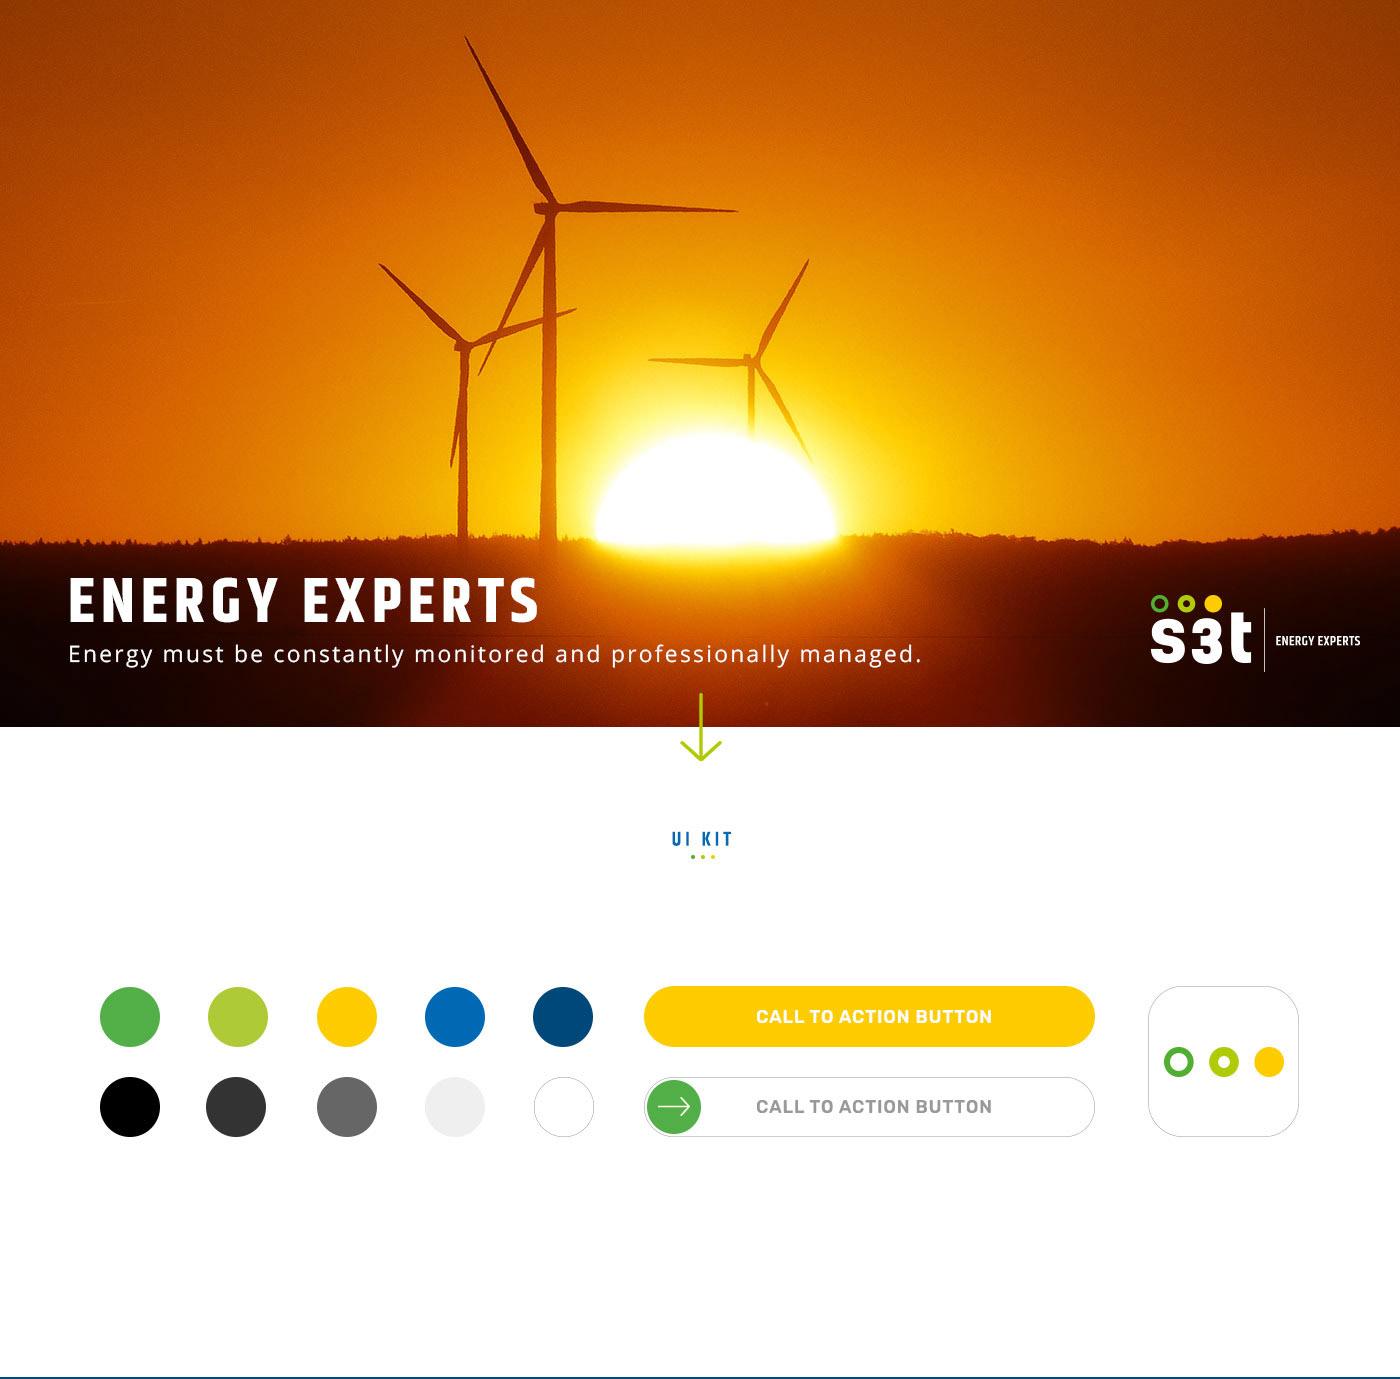 energy,Green Energy,landingpage,onepage,green,Technology,recycle,Renewable Energy,clean energy,innovation